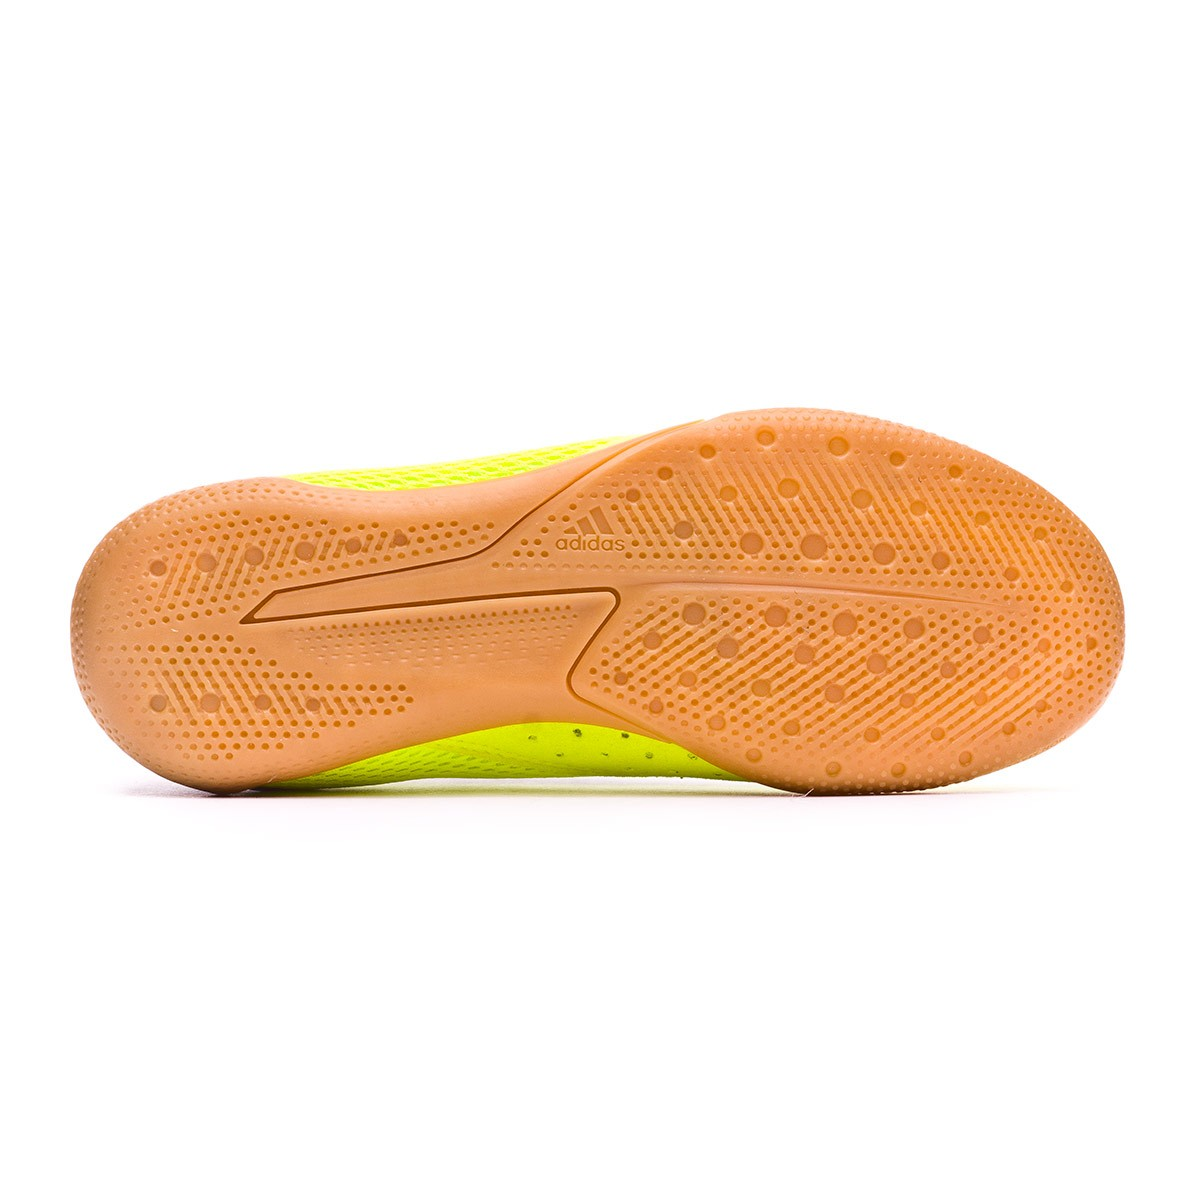 Sapatilha de Futsal adidas X Tango 18.3 IN Crianças